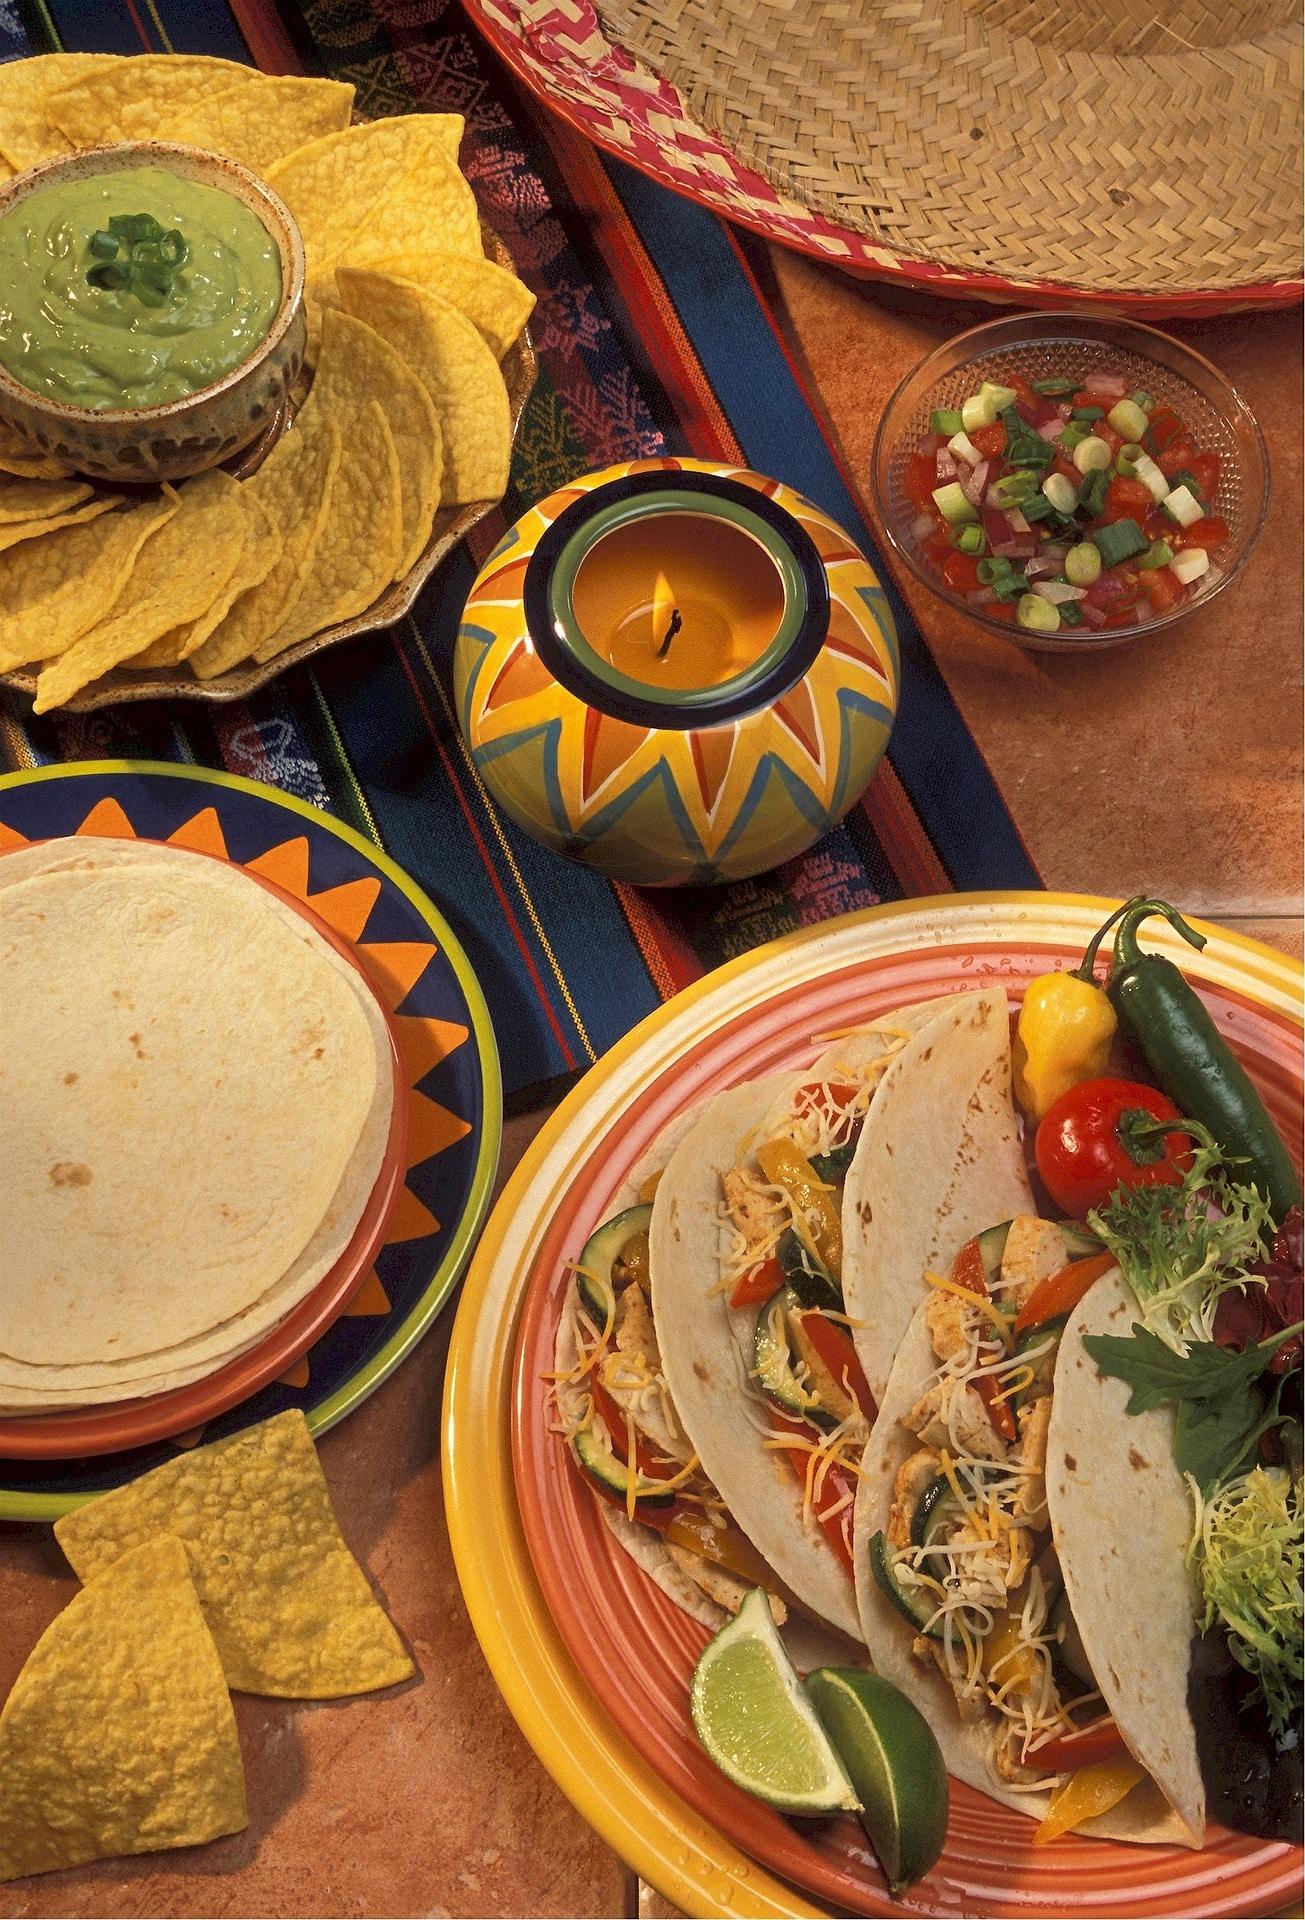 Viva Mexico – Throw an Awesome Cinco de Mayo Party via @mermaidsandmojitos